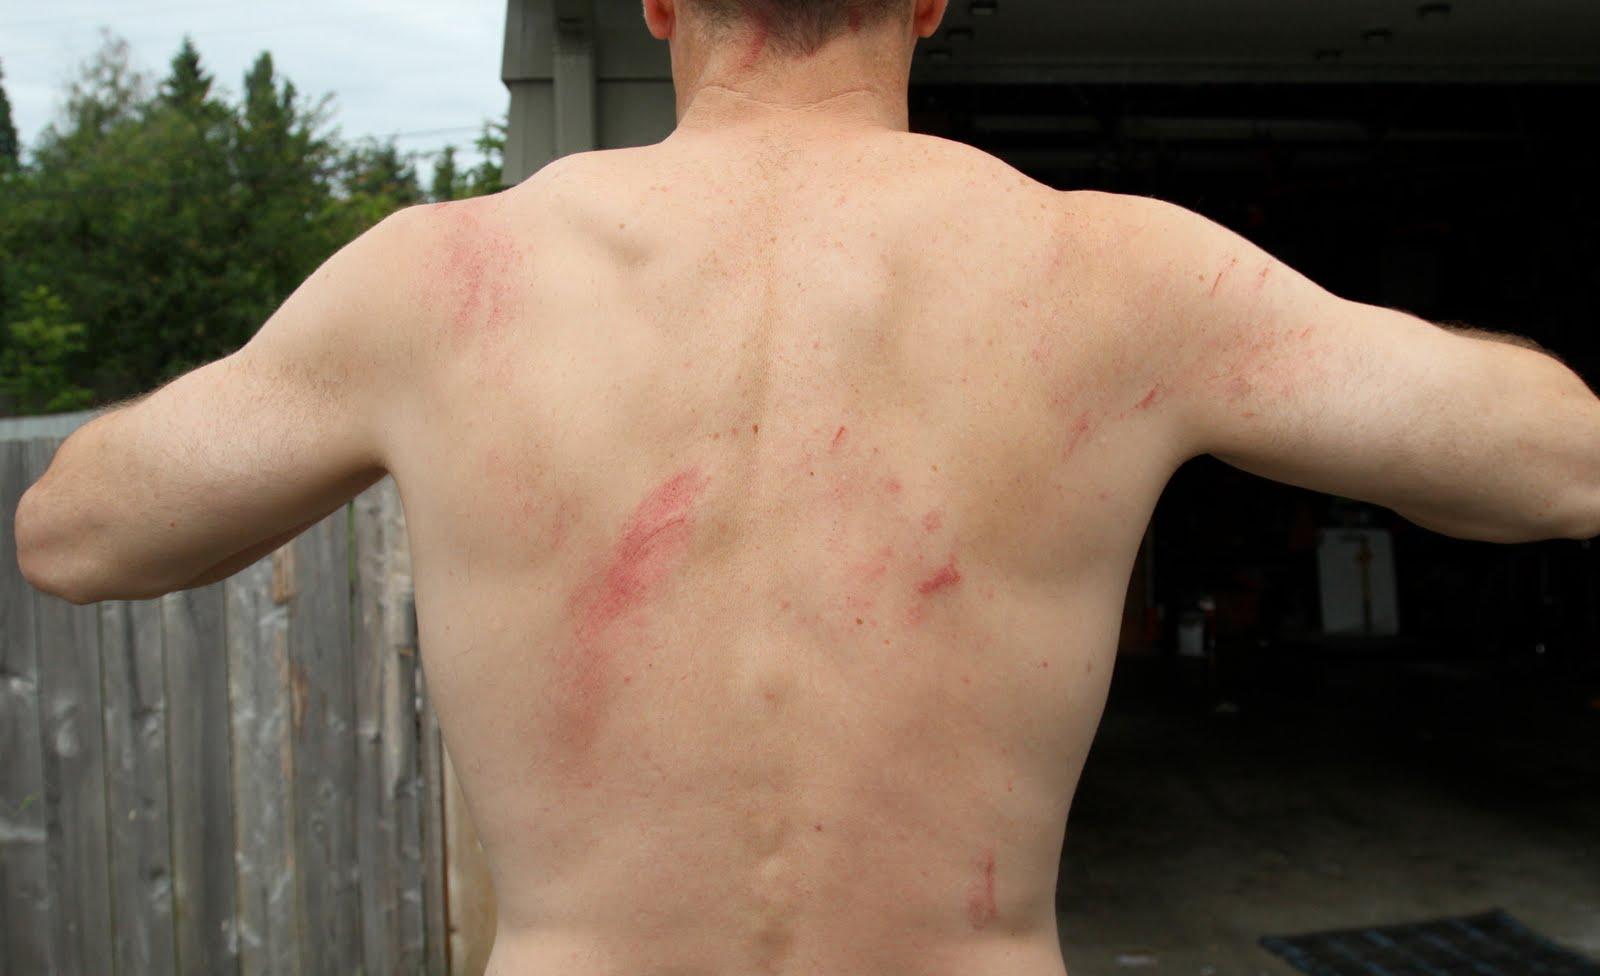 Crack jeu gratuit. is my rib bruised or cracked. mychat 5.2 crack.